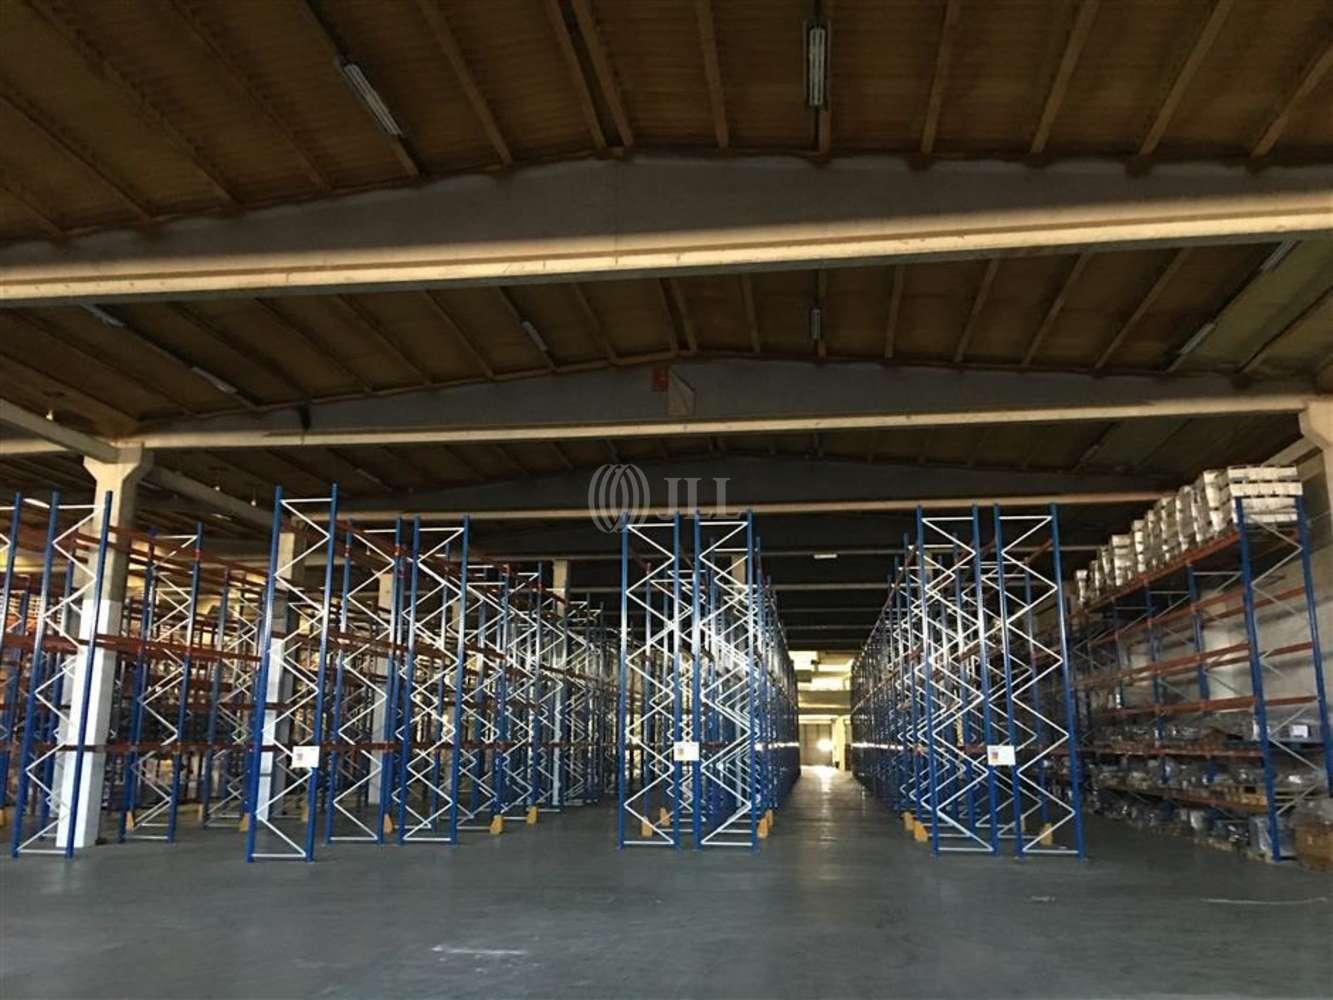 Naves industriales y logísticas Sant fruitós de bages, 08272 - Nave Logistica - B0425 - PI SANT ISIDRE - 8725